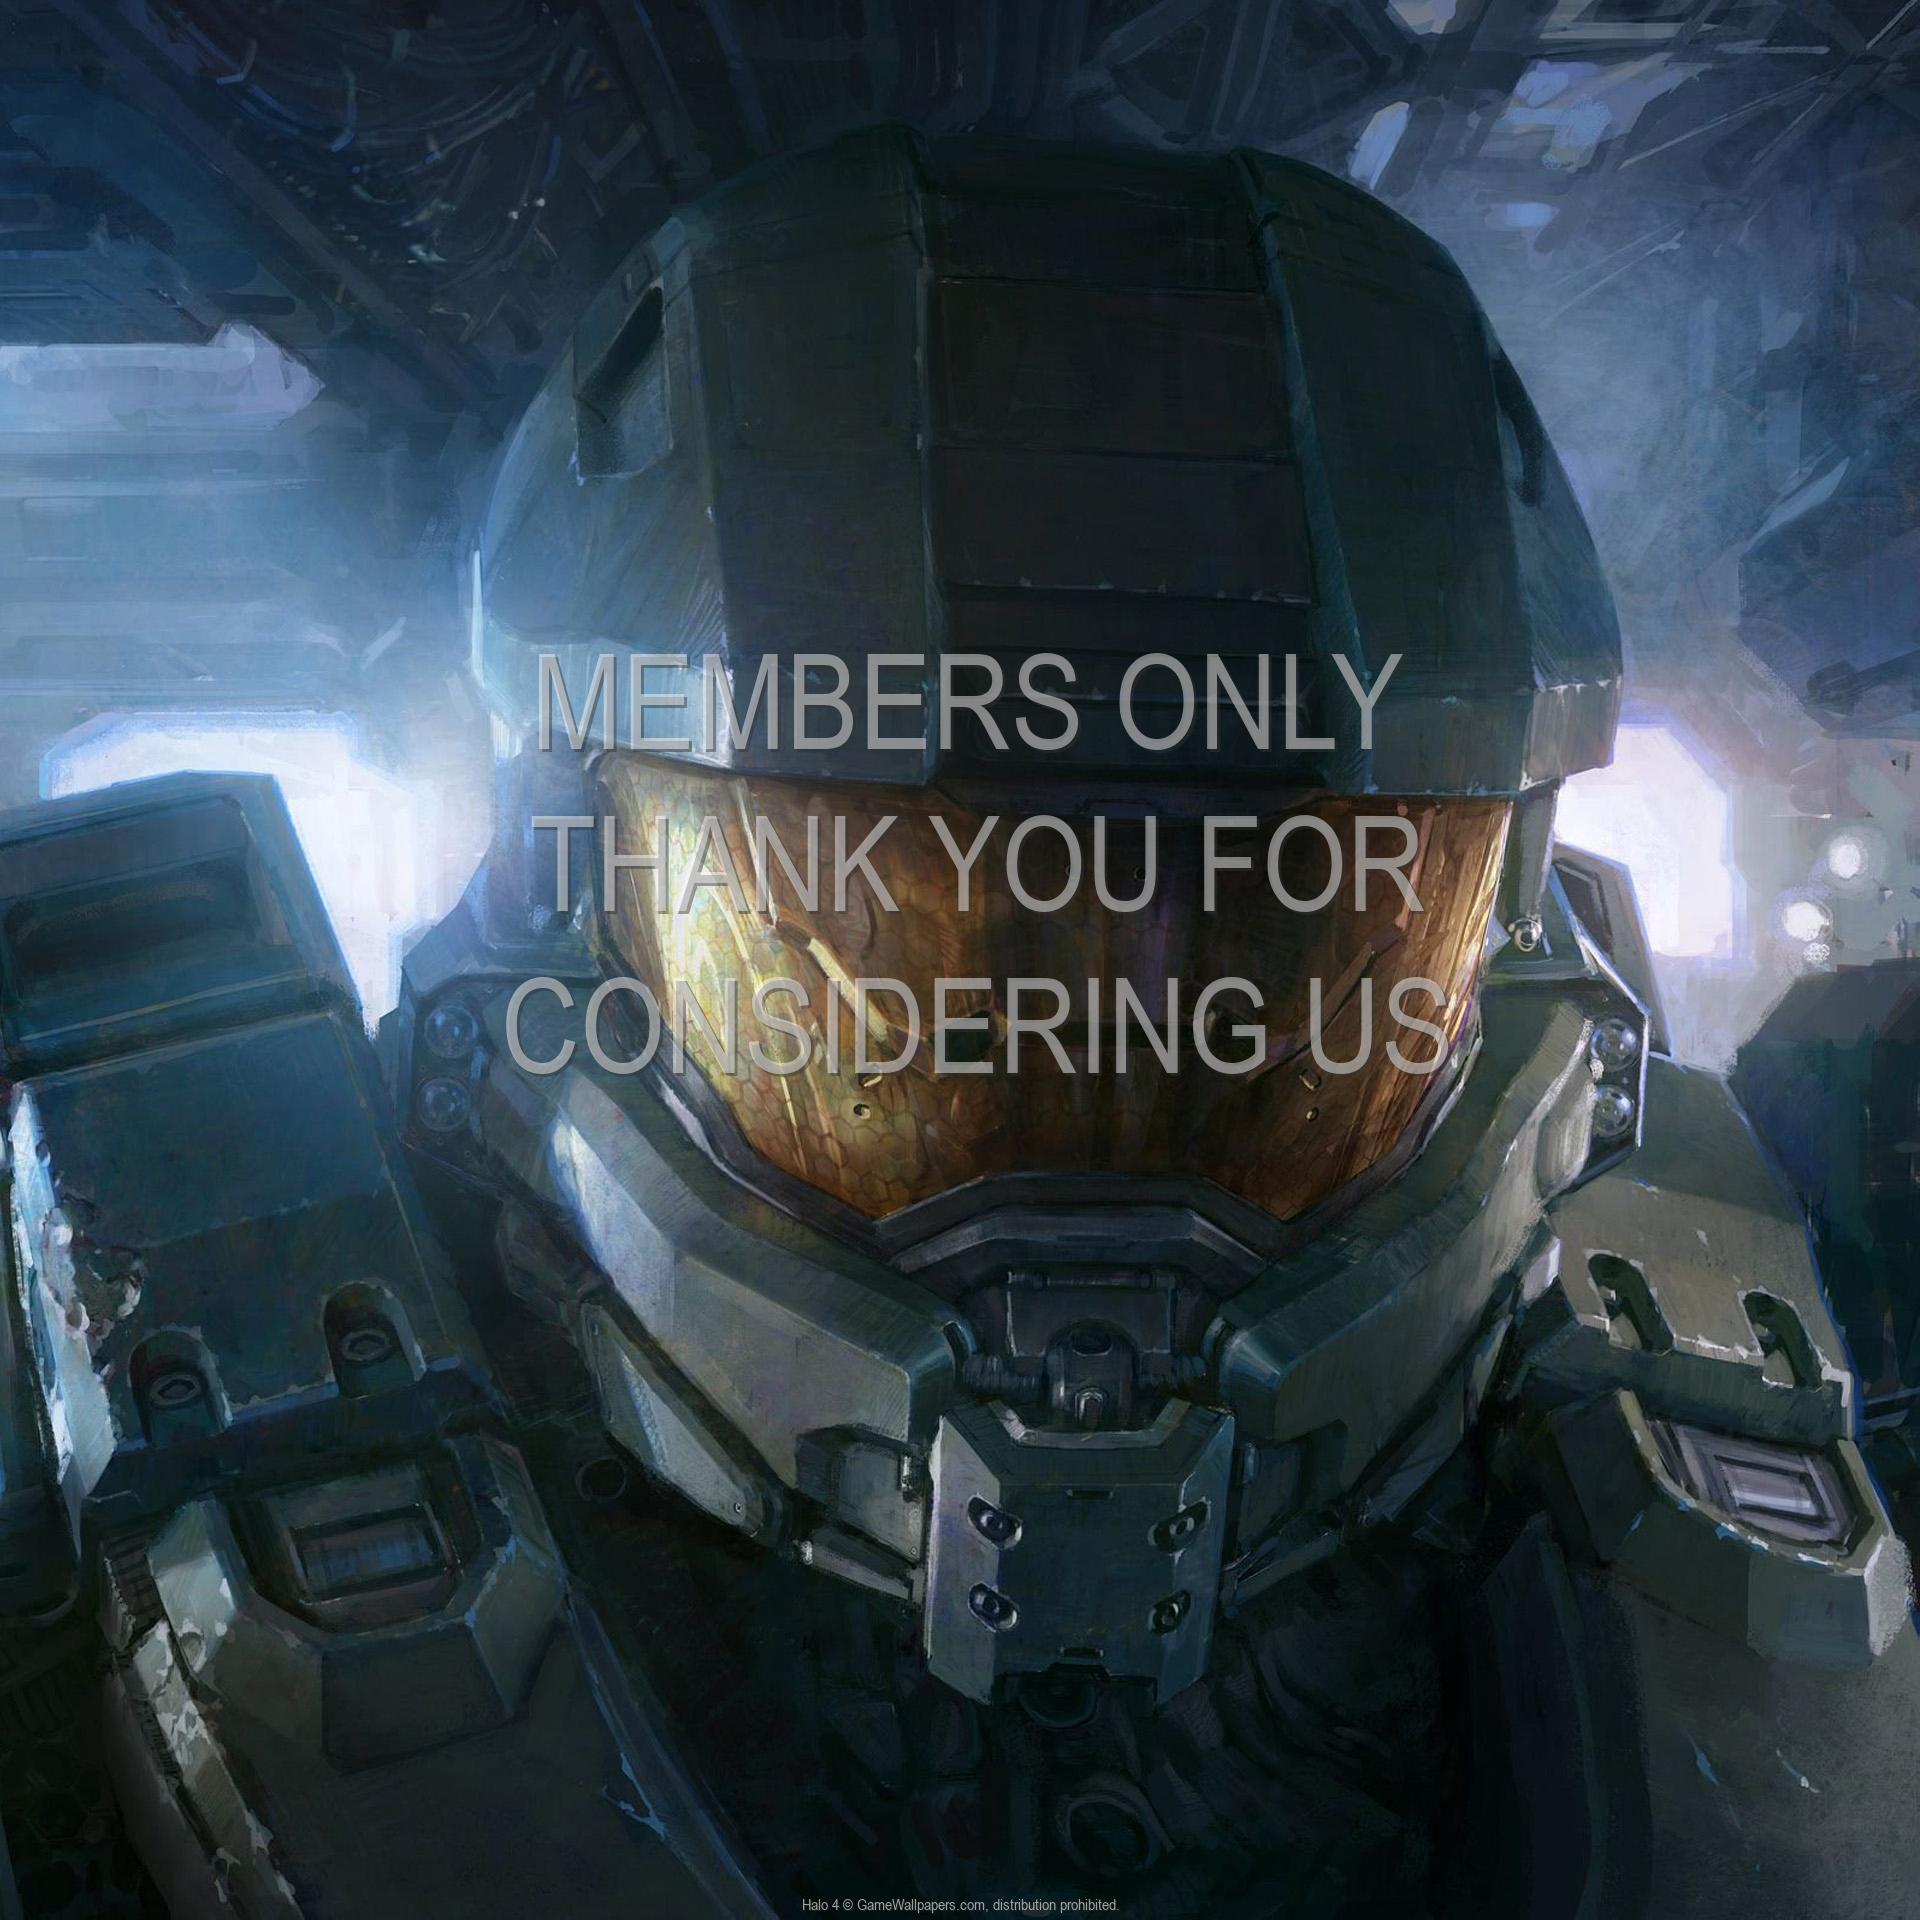 Halo 4 1920x1080 Handy Hintergrundbild 08